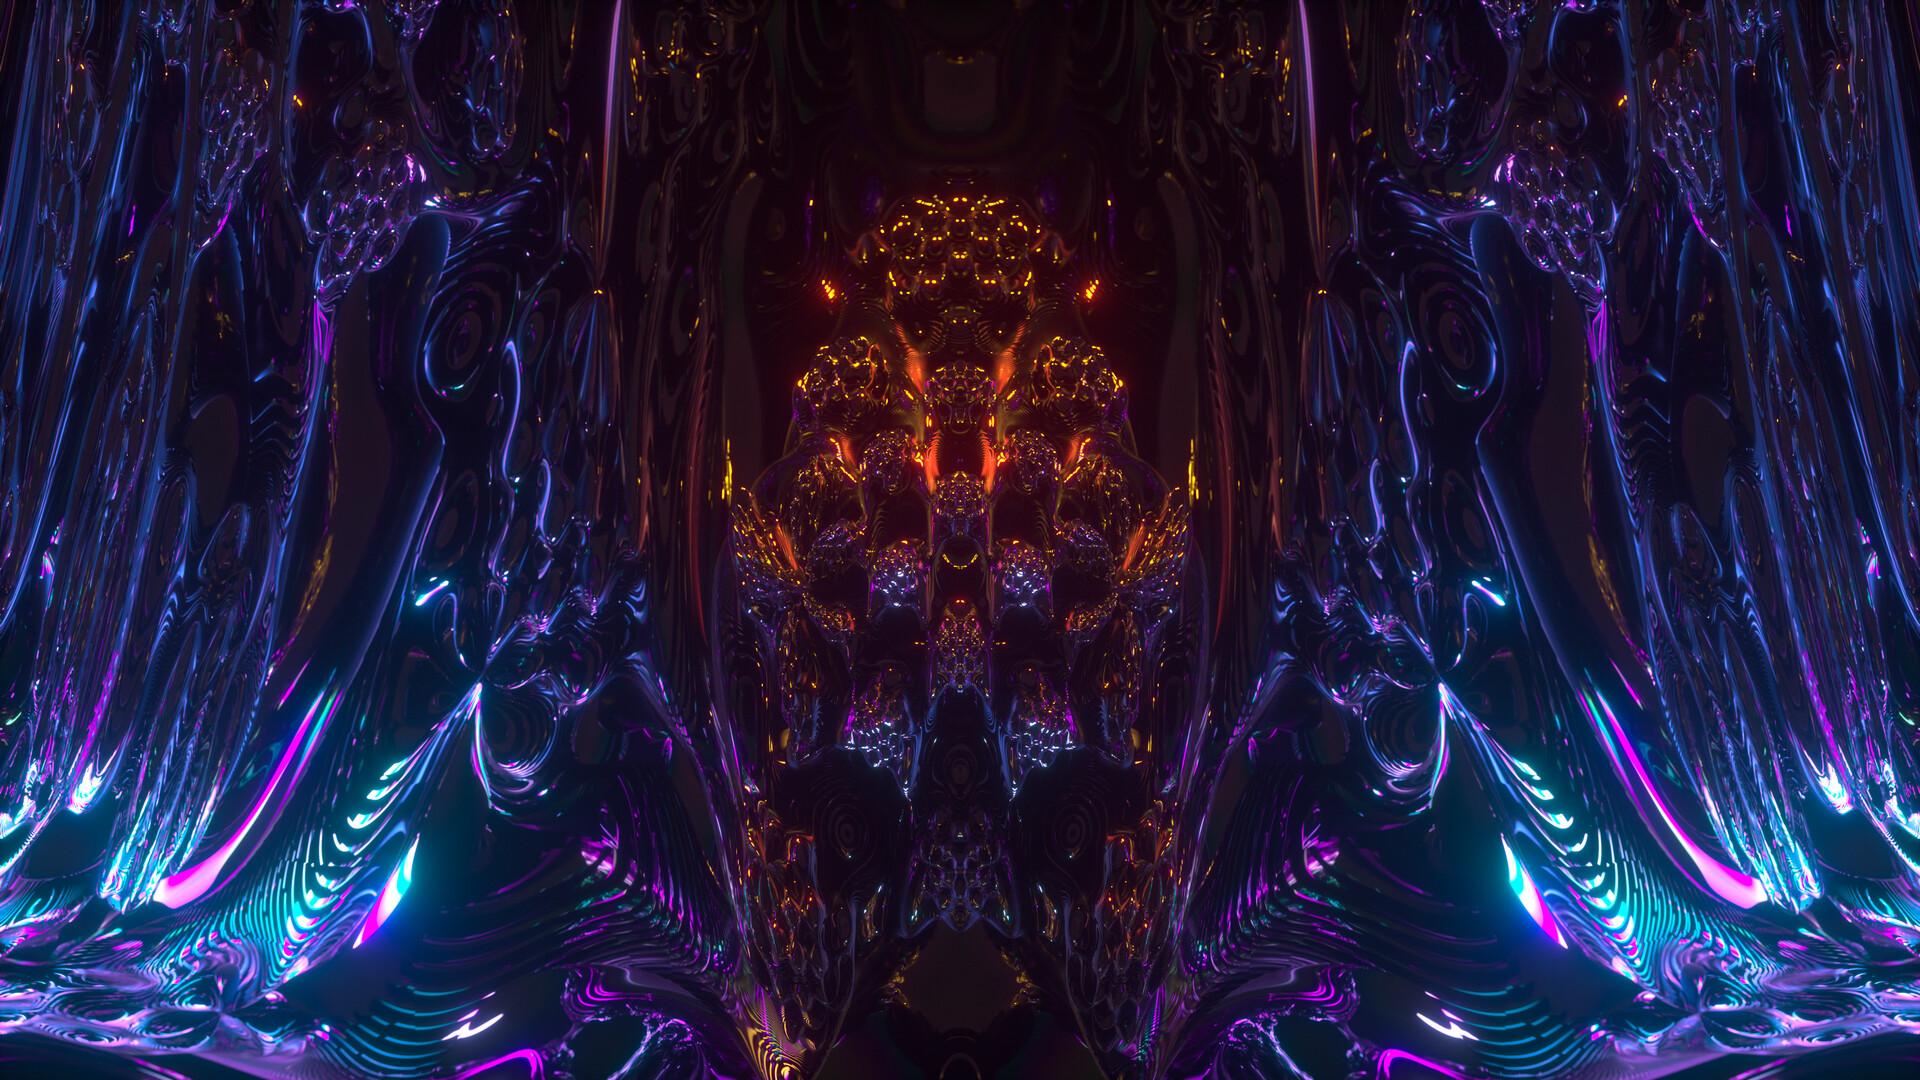 ArtStation - Vectron Close Up, Konnor Reece